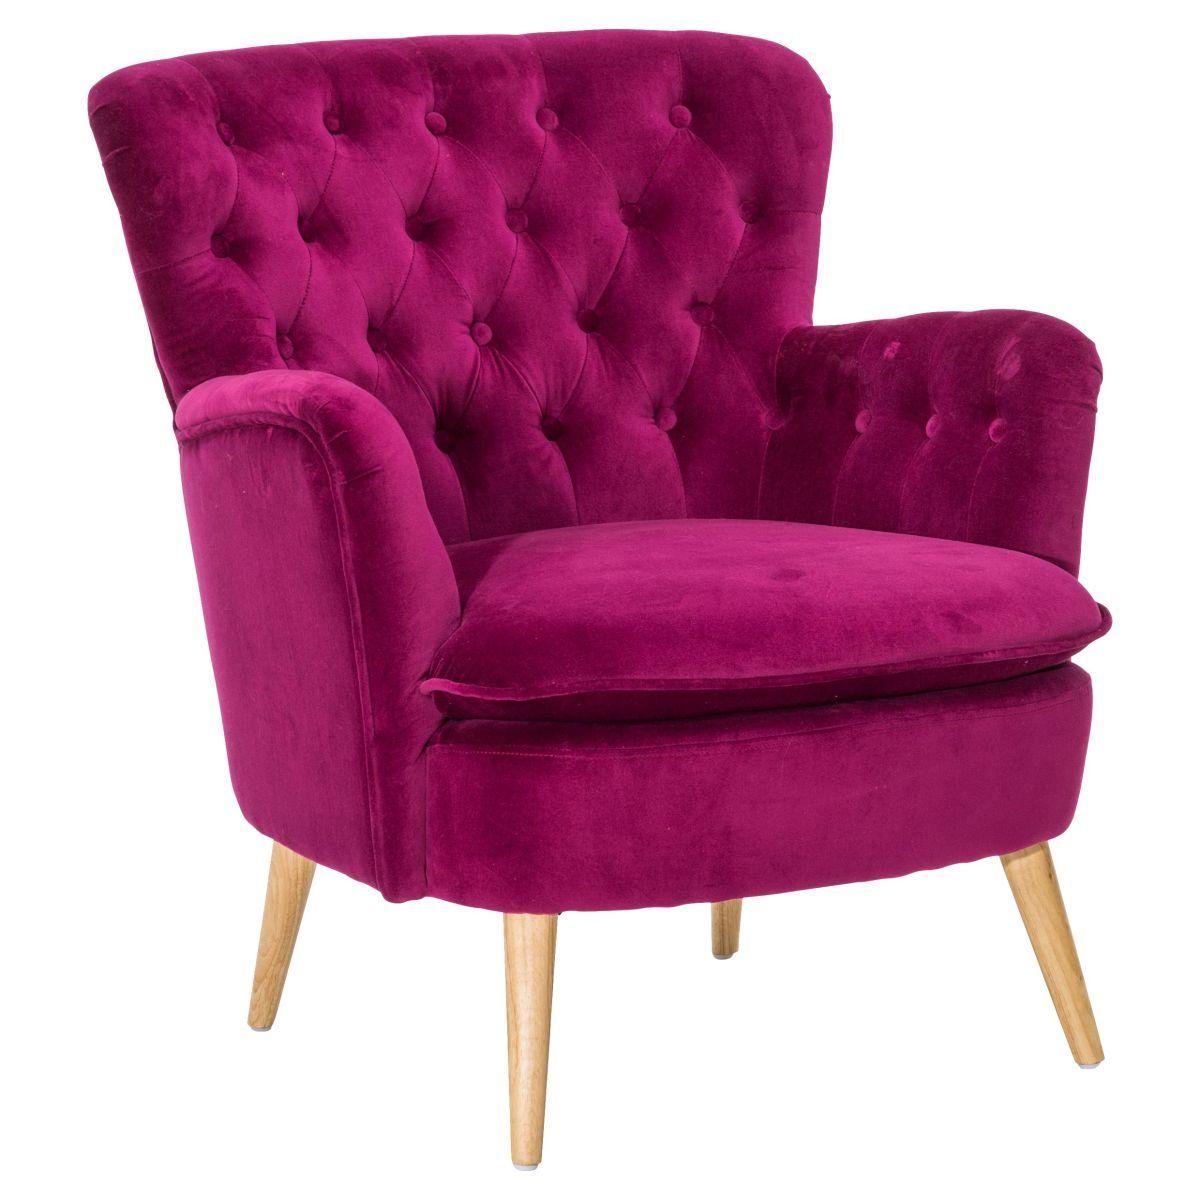 Retro Sessel Home Decor Pinterest Sofa Chair And Armchair